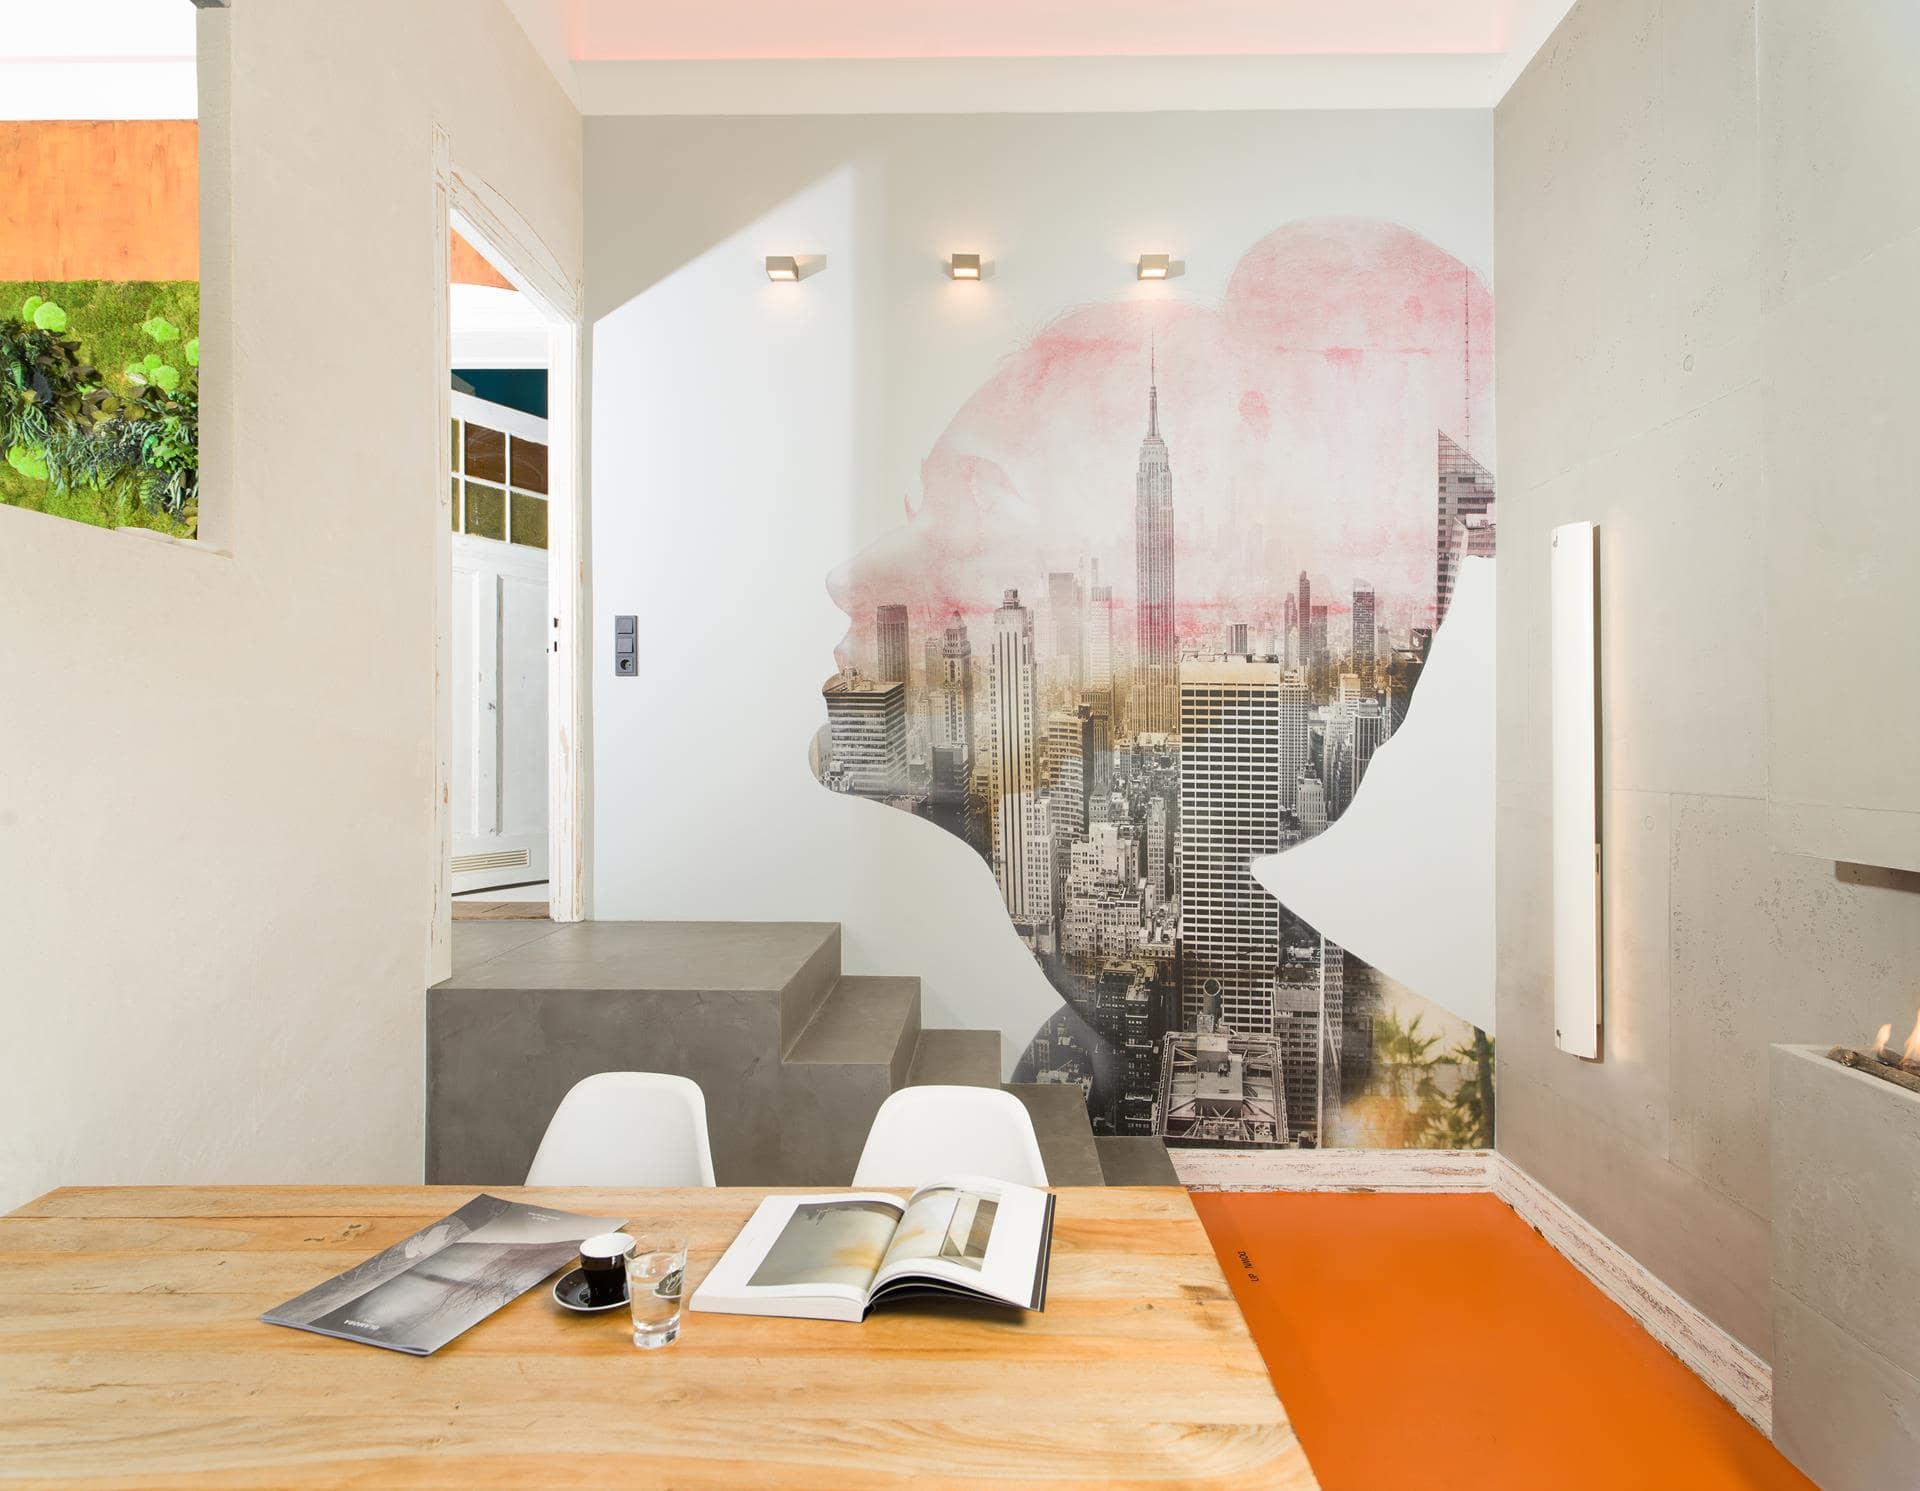 Ausstellung-Showroom-bad-glamora-spachtelboden-betonoptik-fugenlos-gestaltungsmaler-spohn-wiesbaden-03